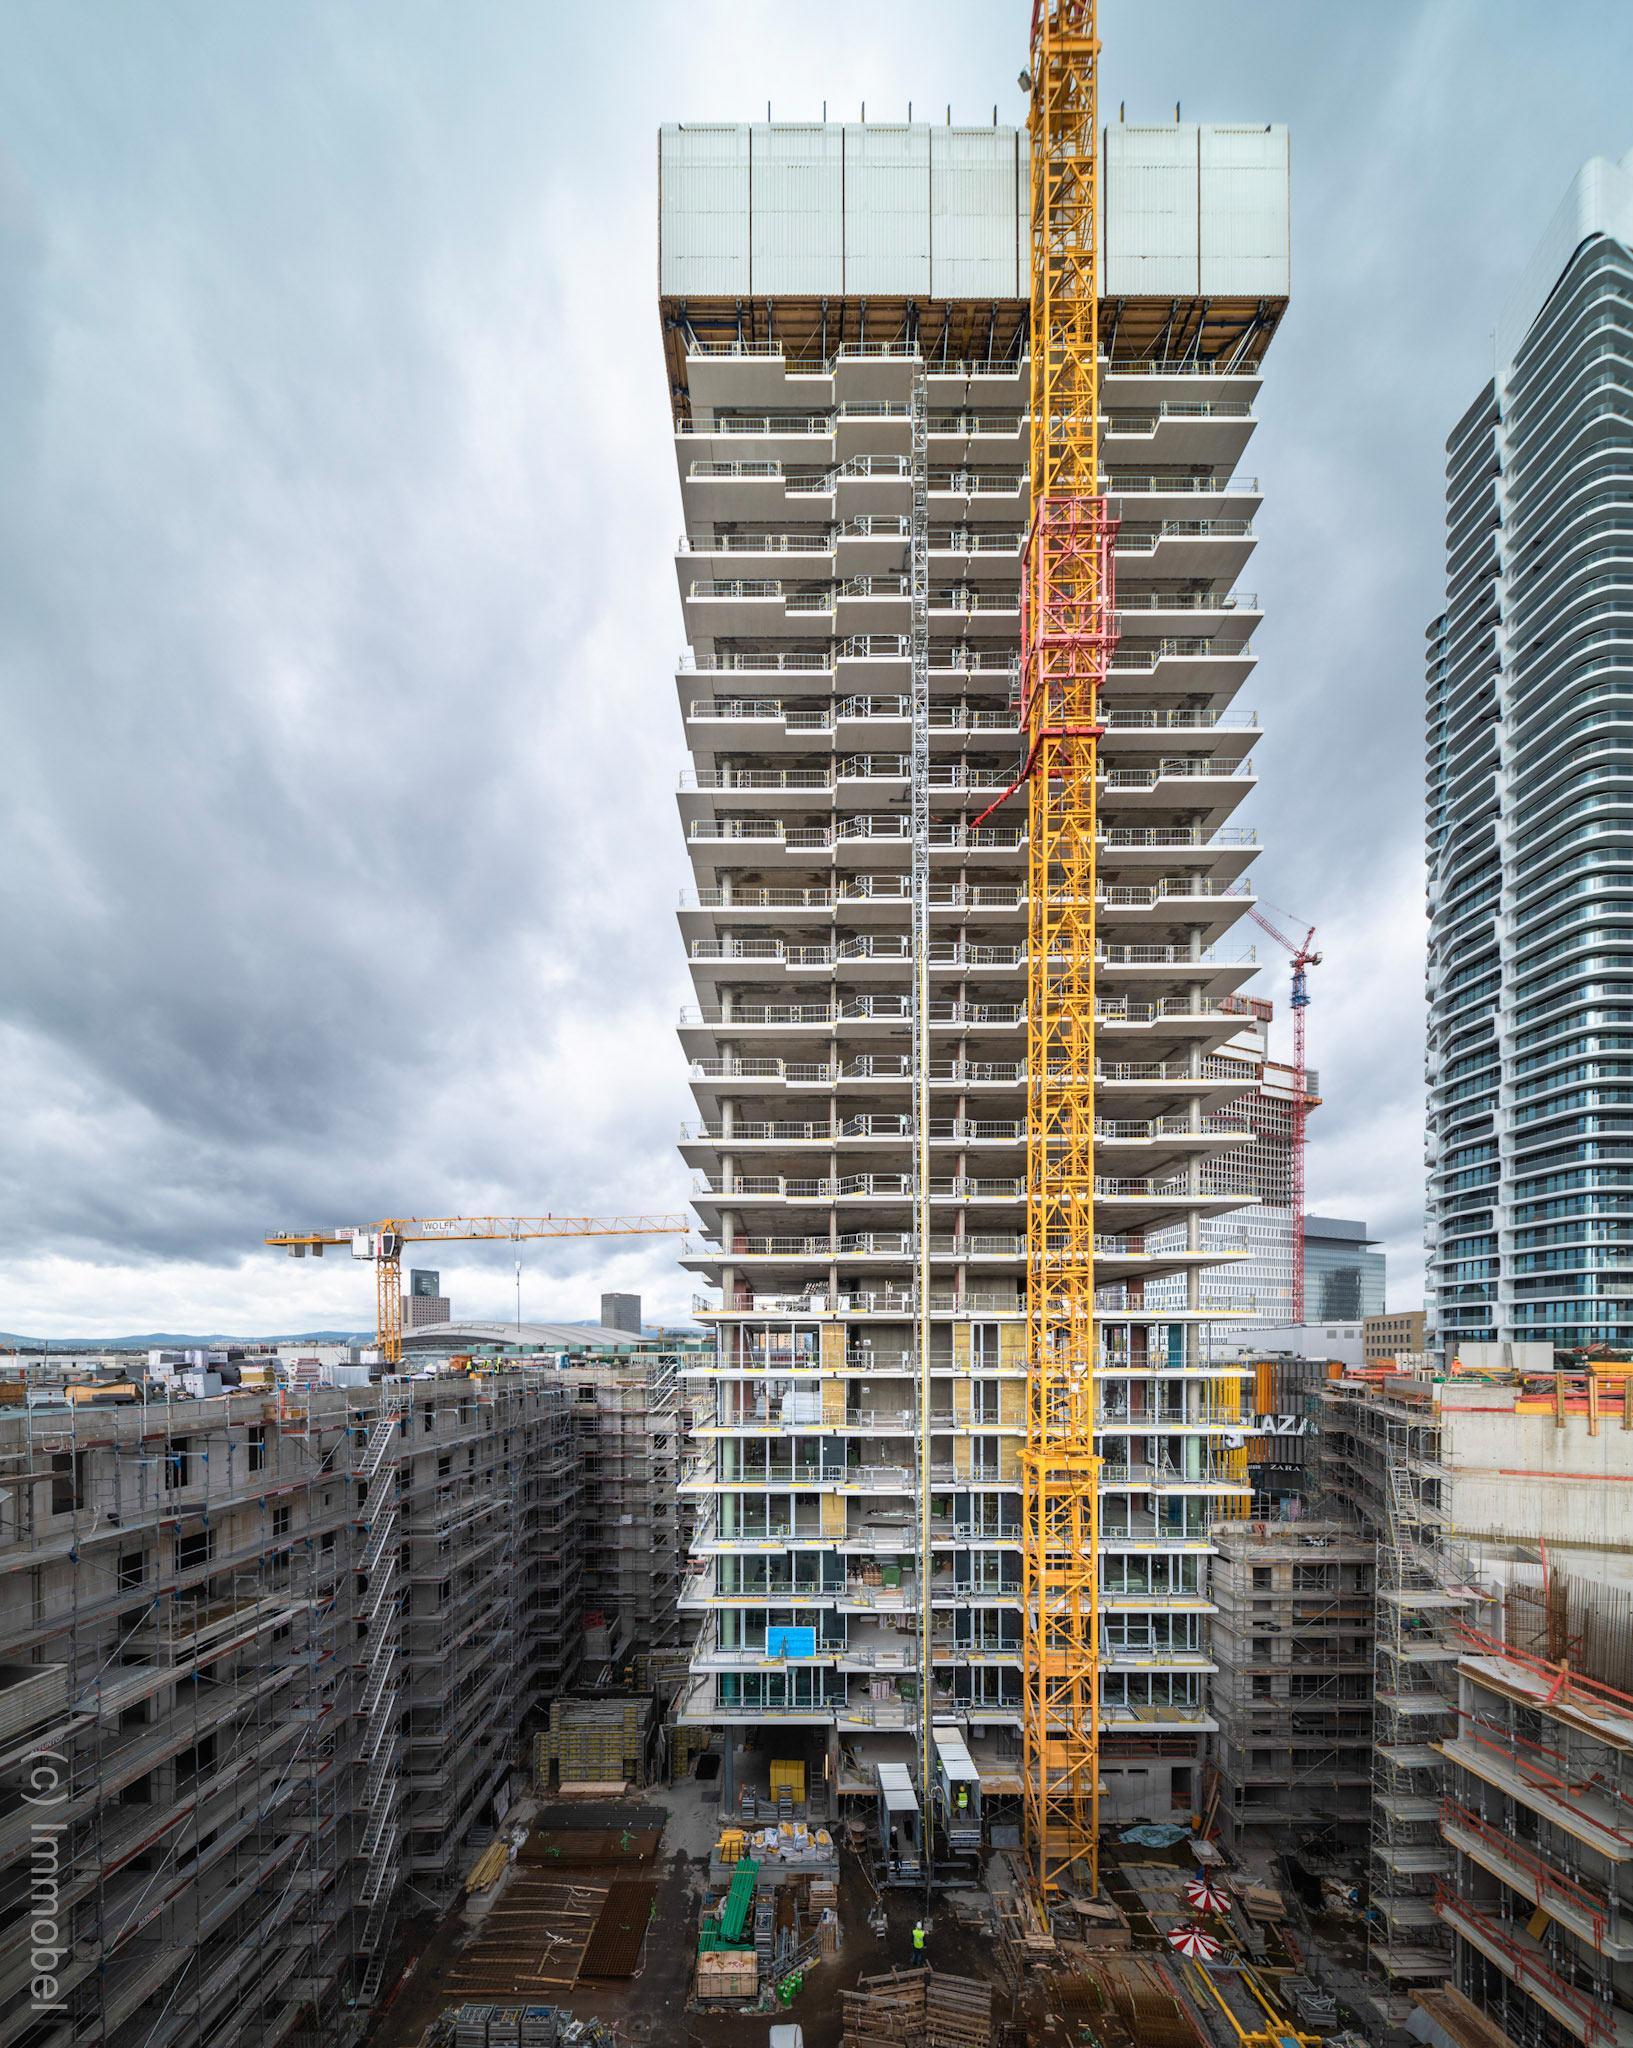 EDEN Frankfurt Baustelle Oktober 2020